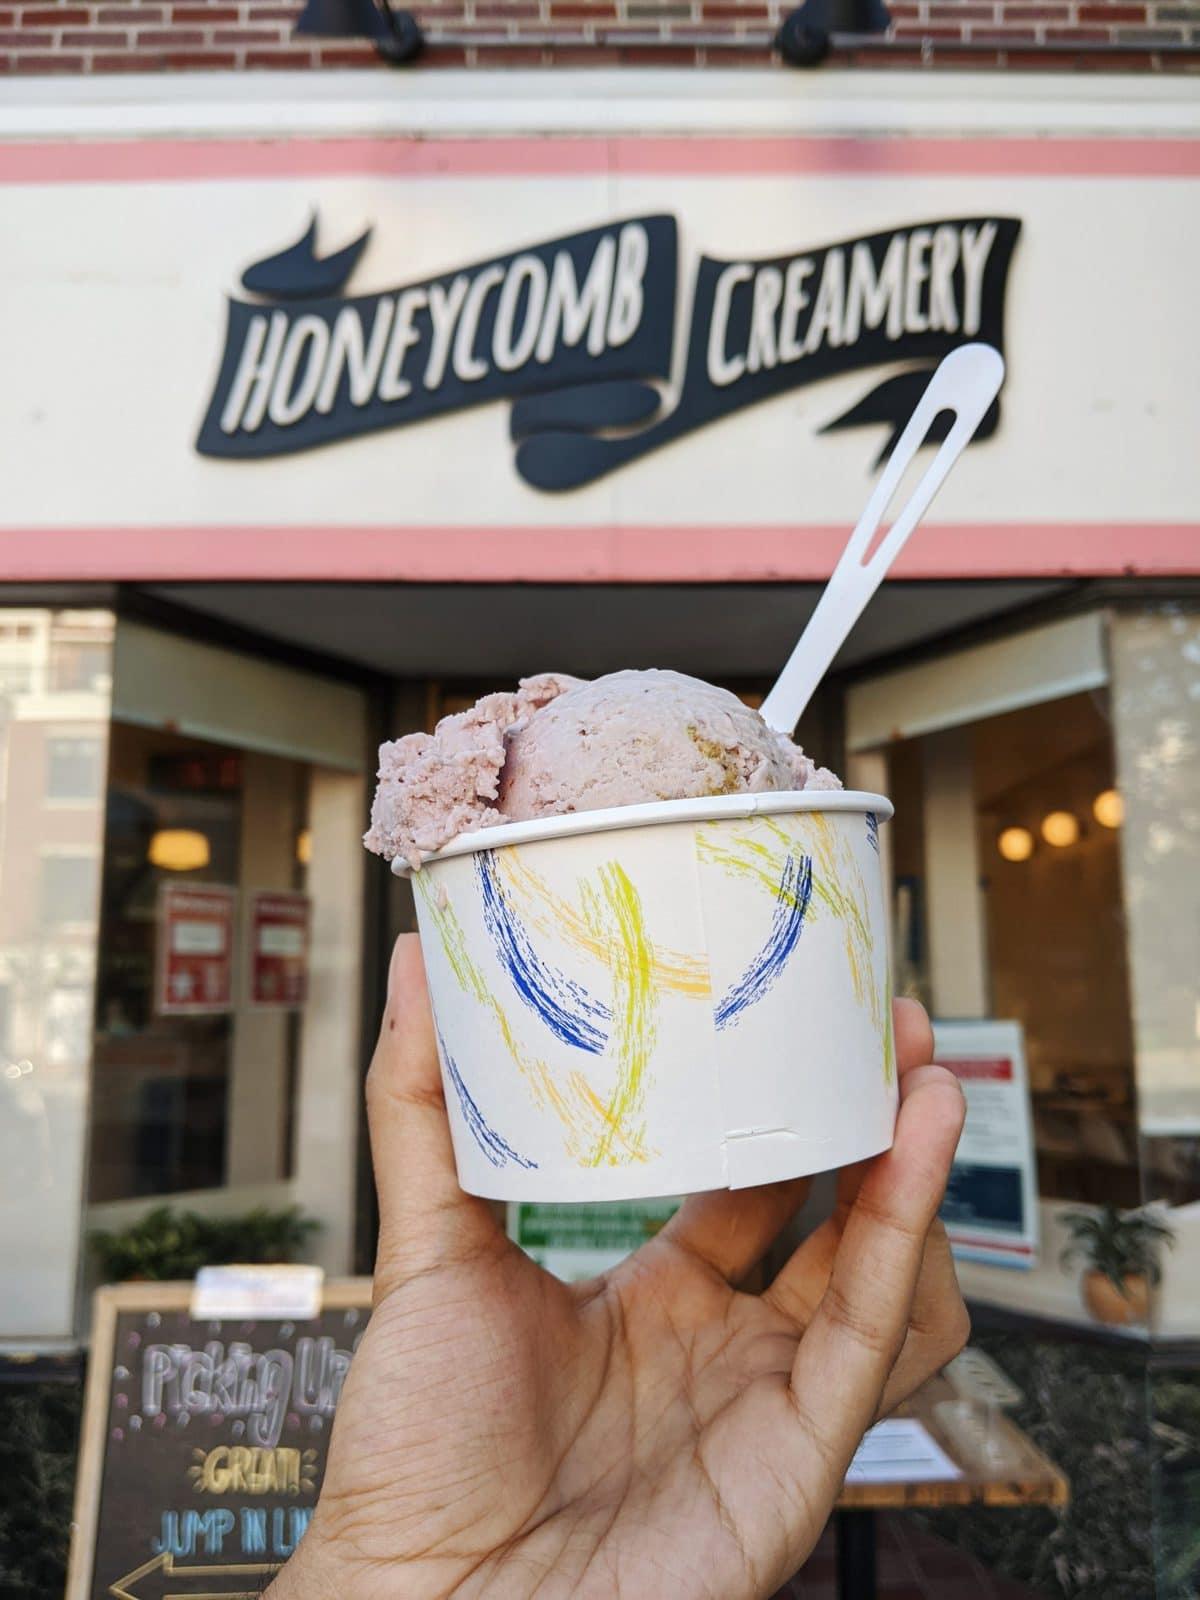 Honeycomb Creamery storefront with vegan ice cream in foreground